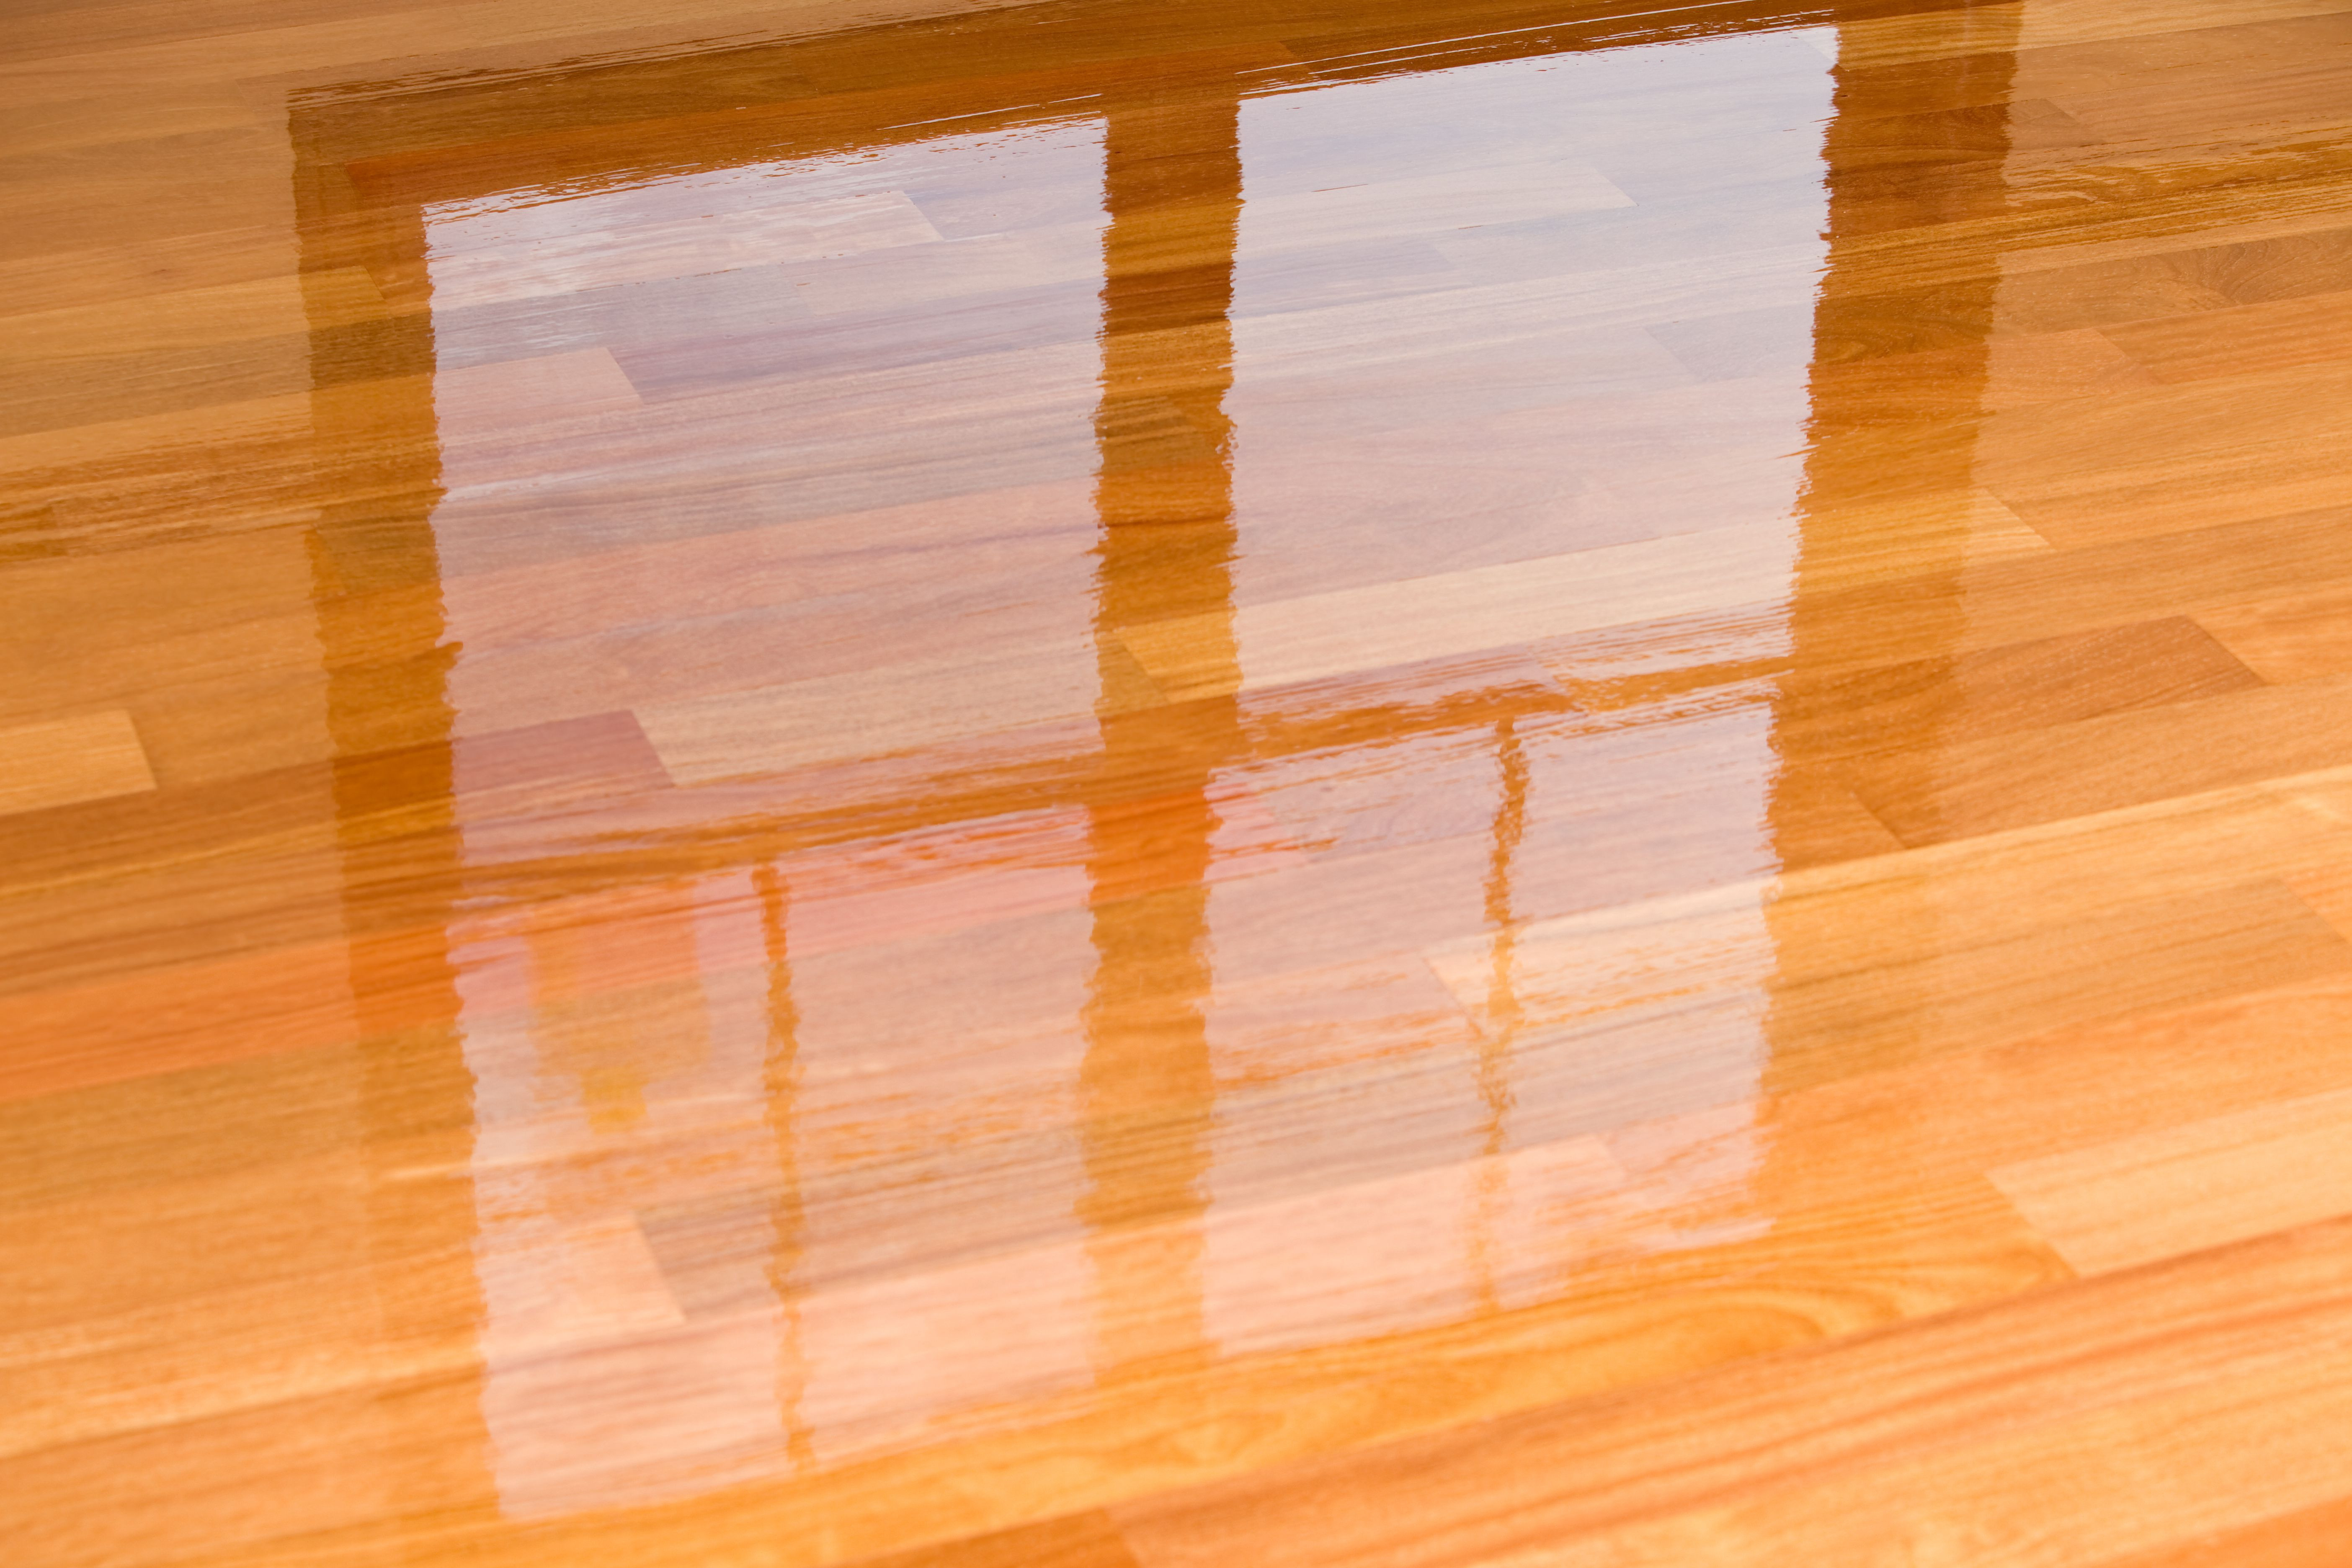 Engineered Hardwood Flooring Vs Hardwood Flooring Of Engineered Wood Flooring Vs Laminate Reviews Home Design Inside Pergo Vs Hardwood Elegant Floor Laminate Vs Flooring Reviews Cleaning Look